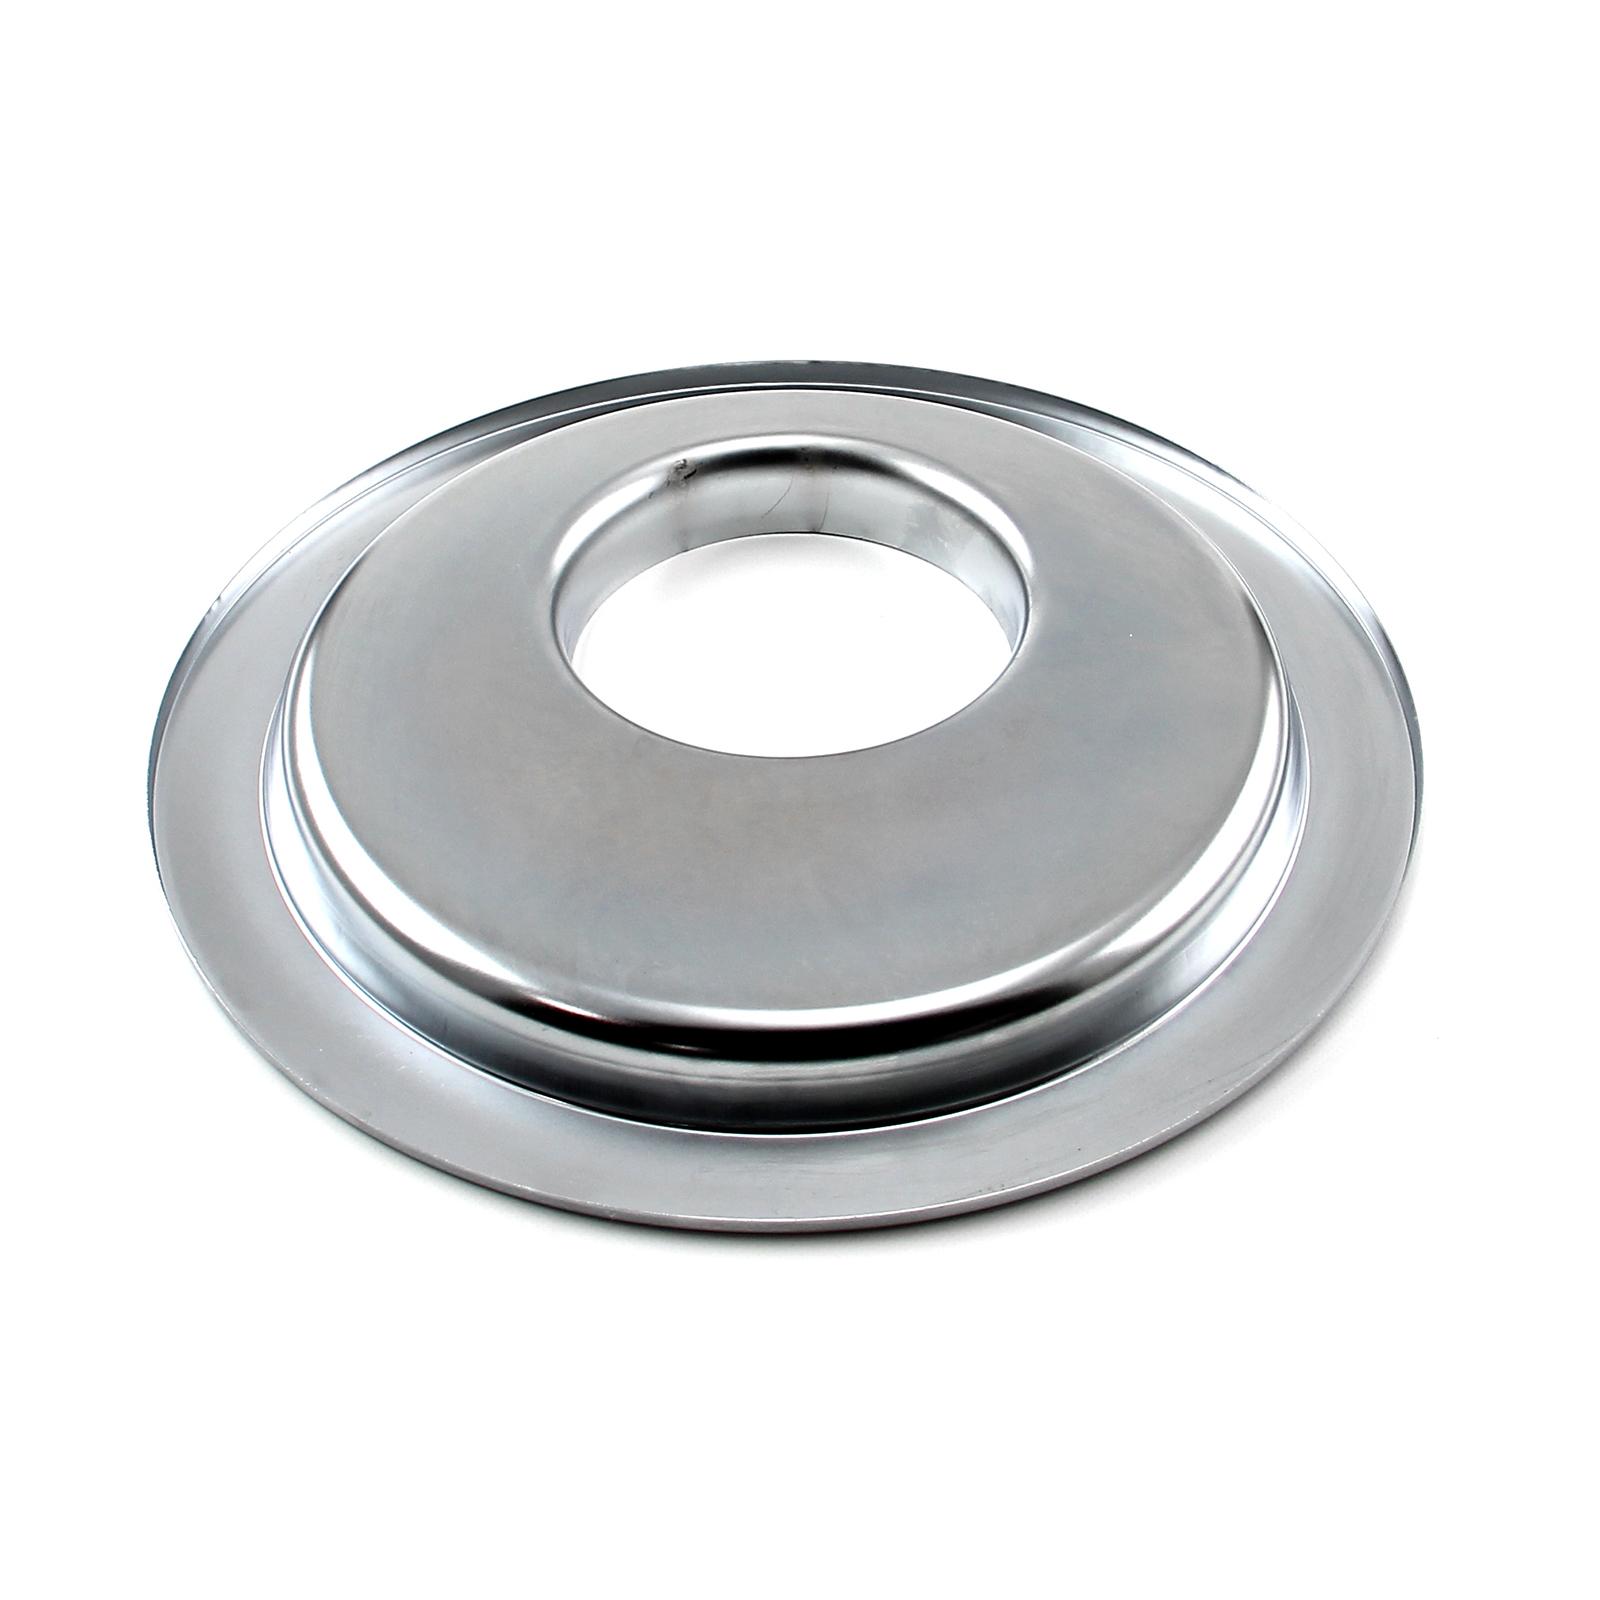 "PCE® PCE101.1004 14"" Chrome Flat Offset Air Cleaner Base"